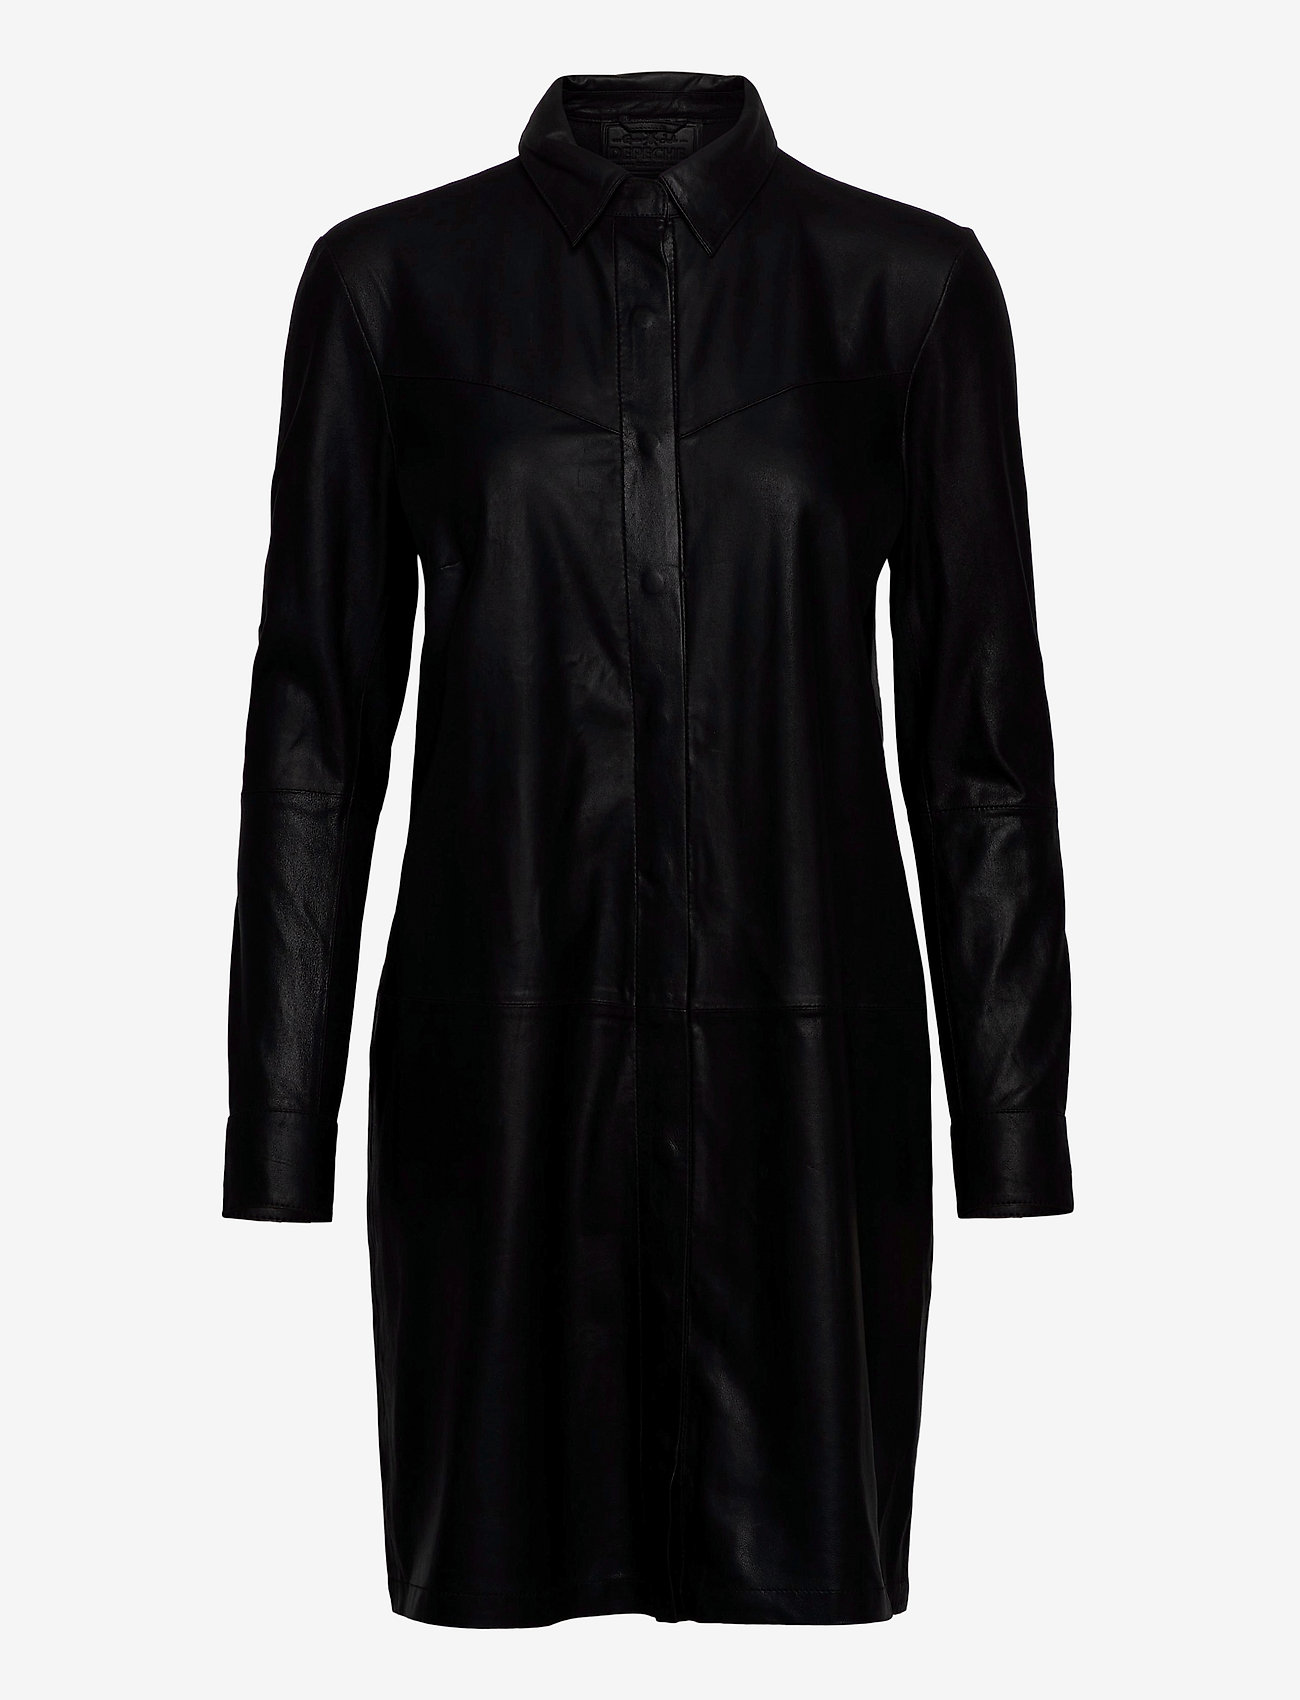 DEPECHE - Long shirt - robes courtes - black - 0